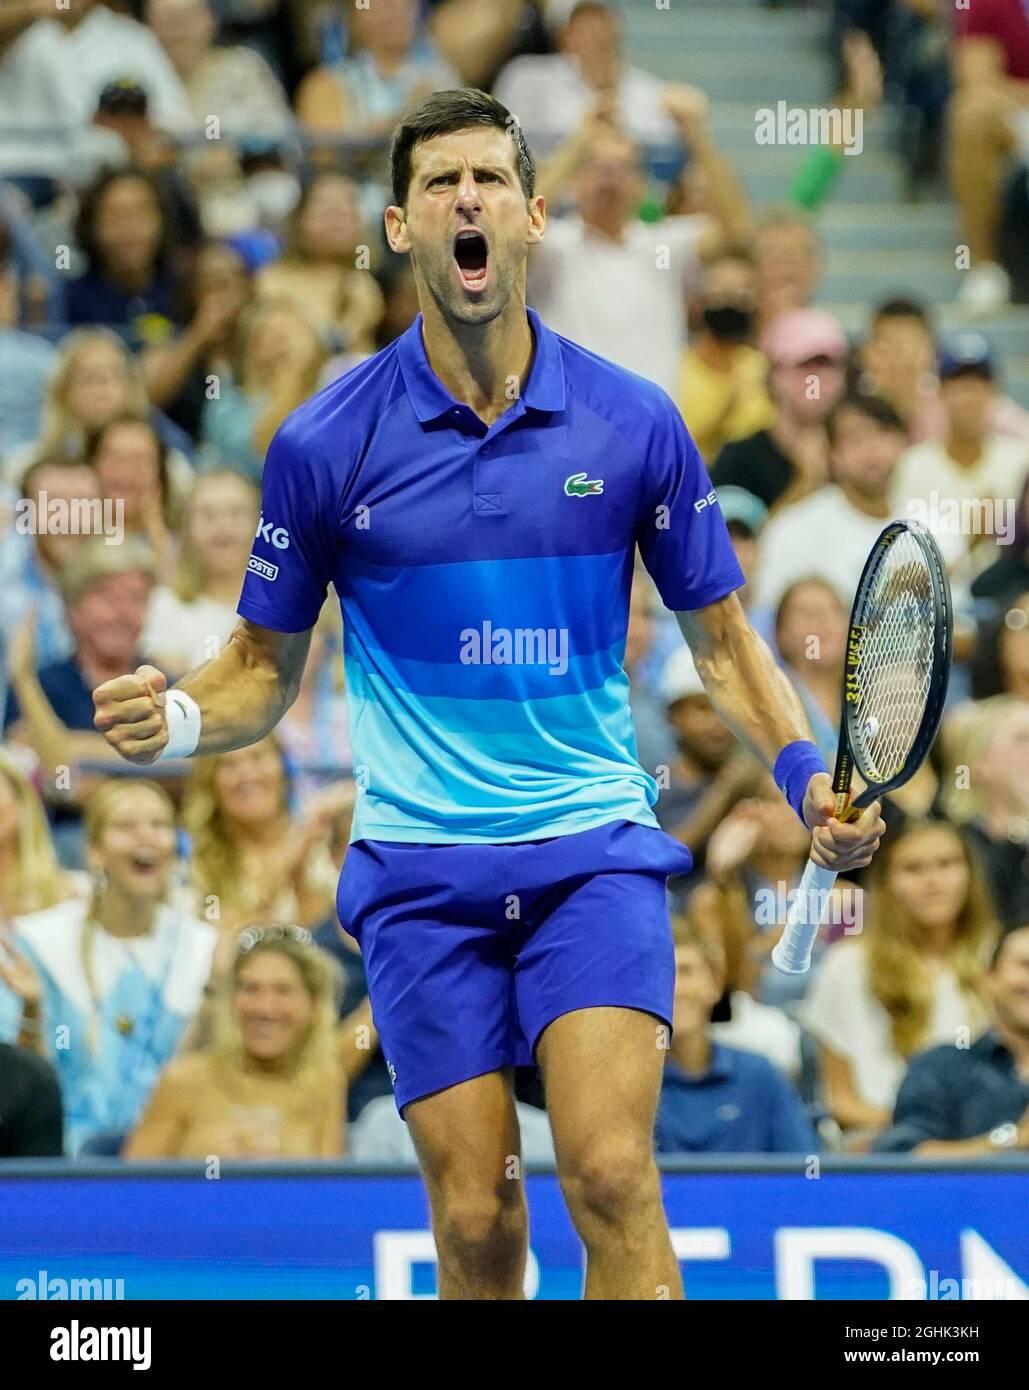 New York, Stati Uniti. 6 settembre 2021: Novak Djokovic (SRB) ha sconfitto Jenson Brooksby (USA) 1-6, 6-3, 6-2, 6-2, 6-2, al US Open in corso di recitazione al Billy Jean King Ntional Tennis Center di Flushing, Queens, New York/USA © Jo Becktold/Tennisclix/CSM/CSM Credit: CAL Sport/Alamy News Live Foto Stock